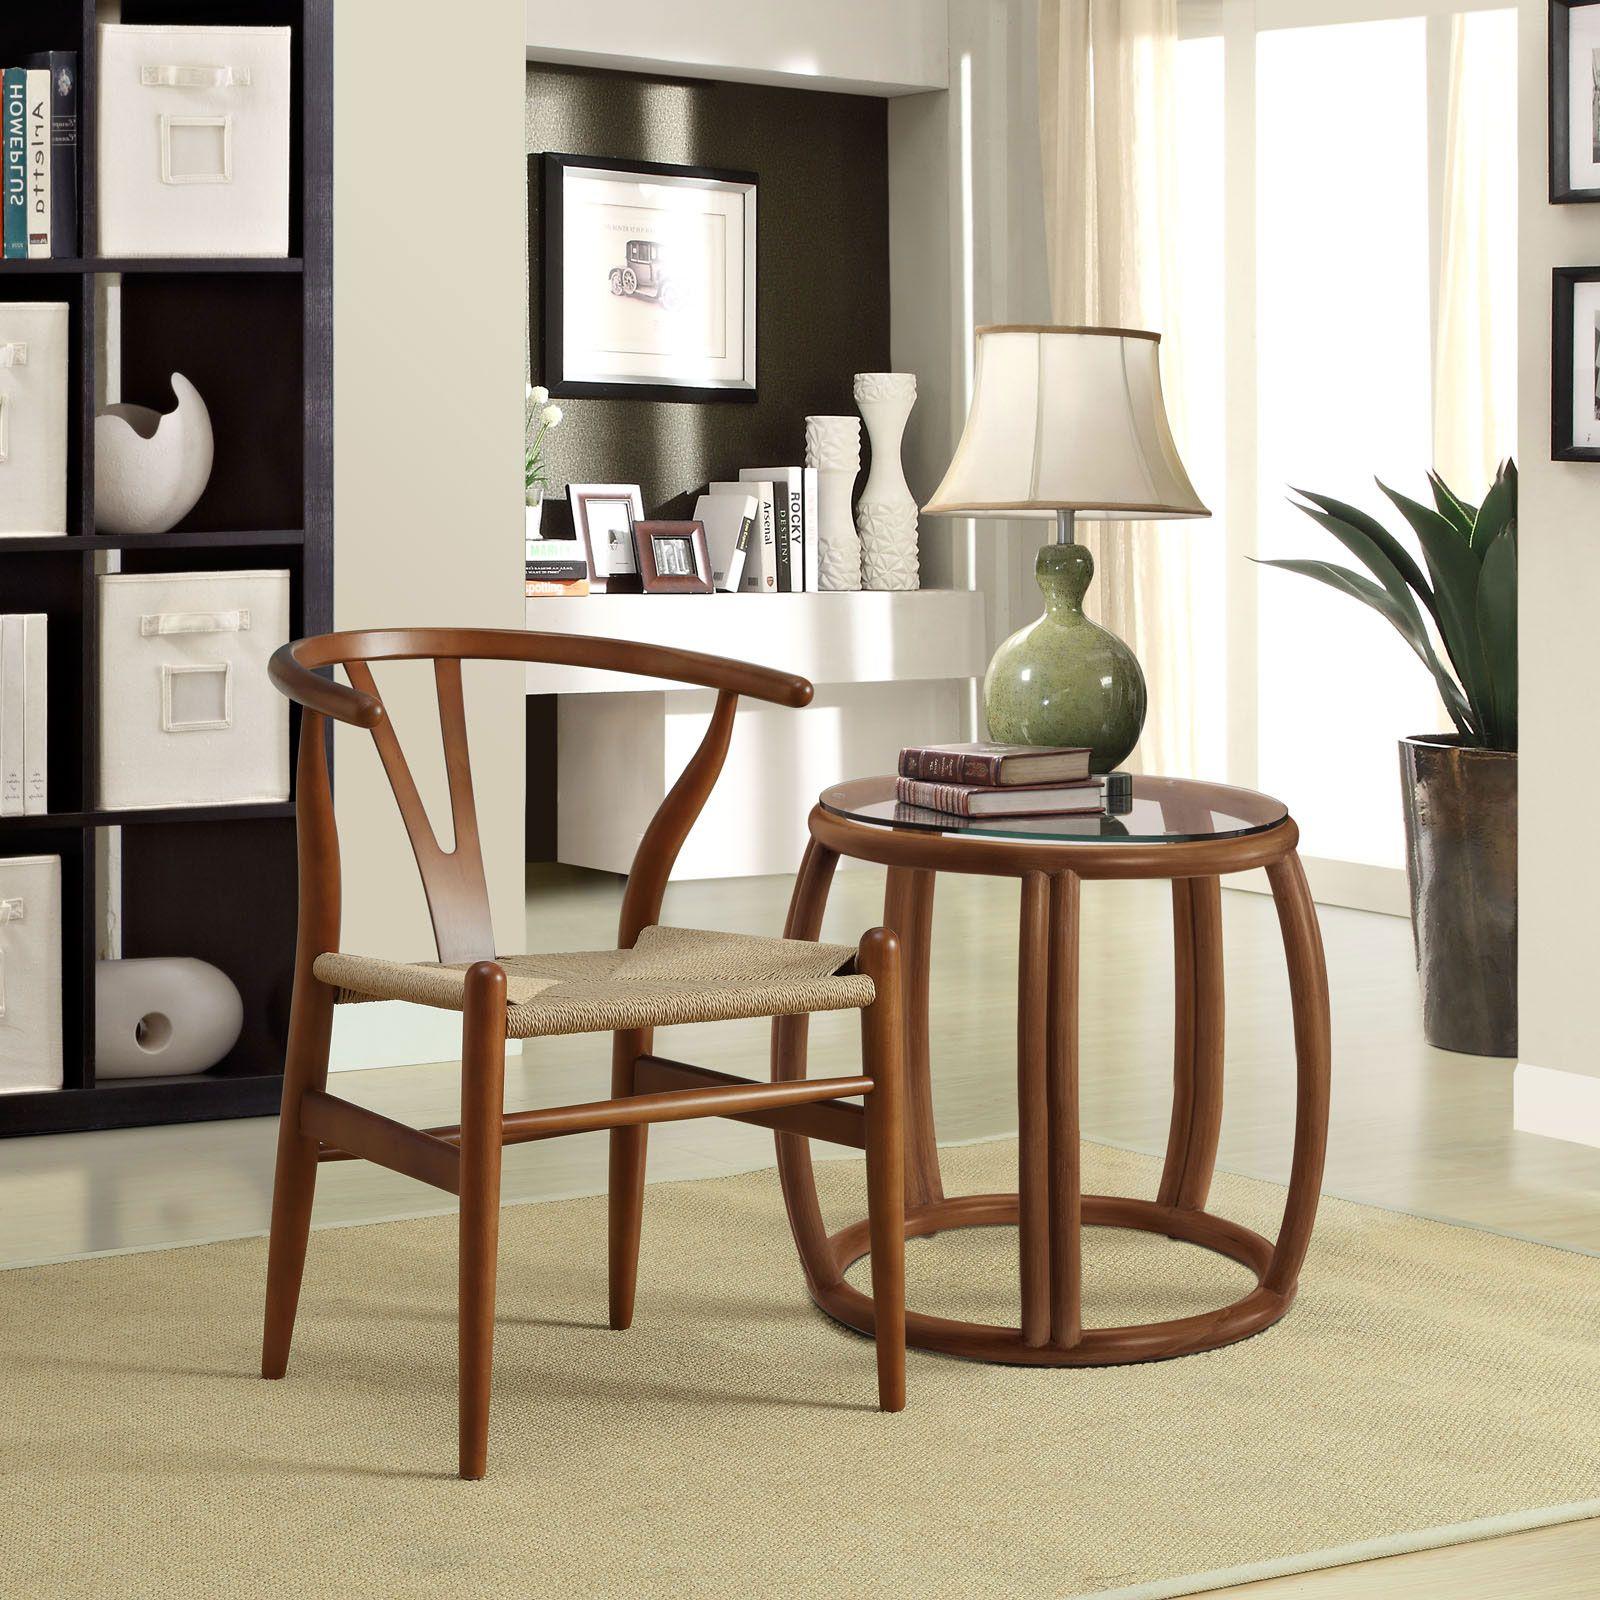 Woven Shaker Chair in Walnut dotandbocom